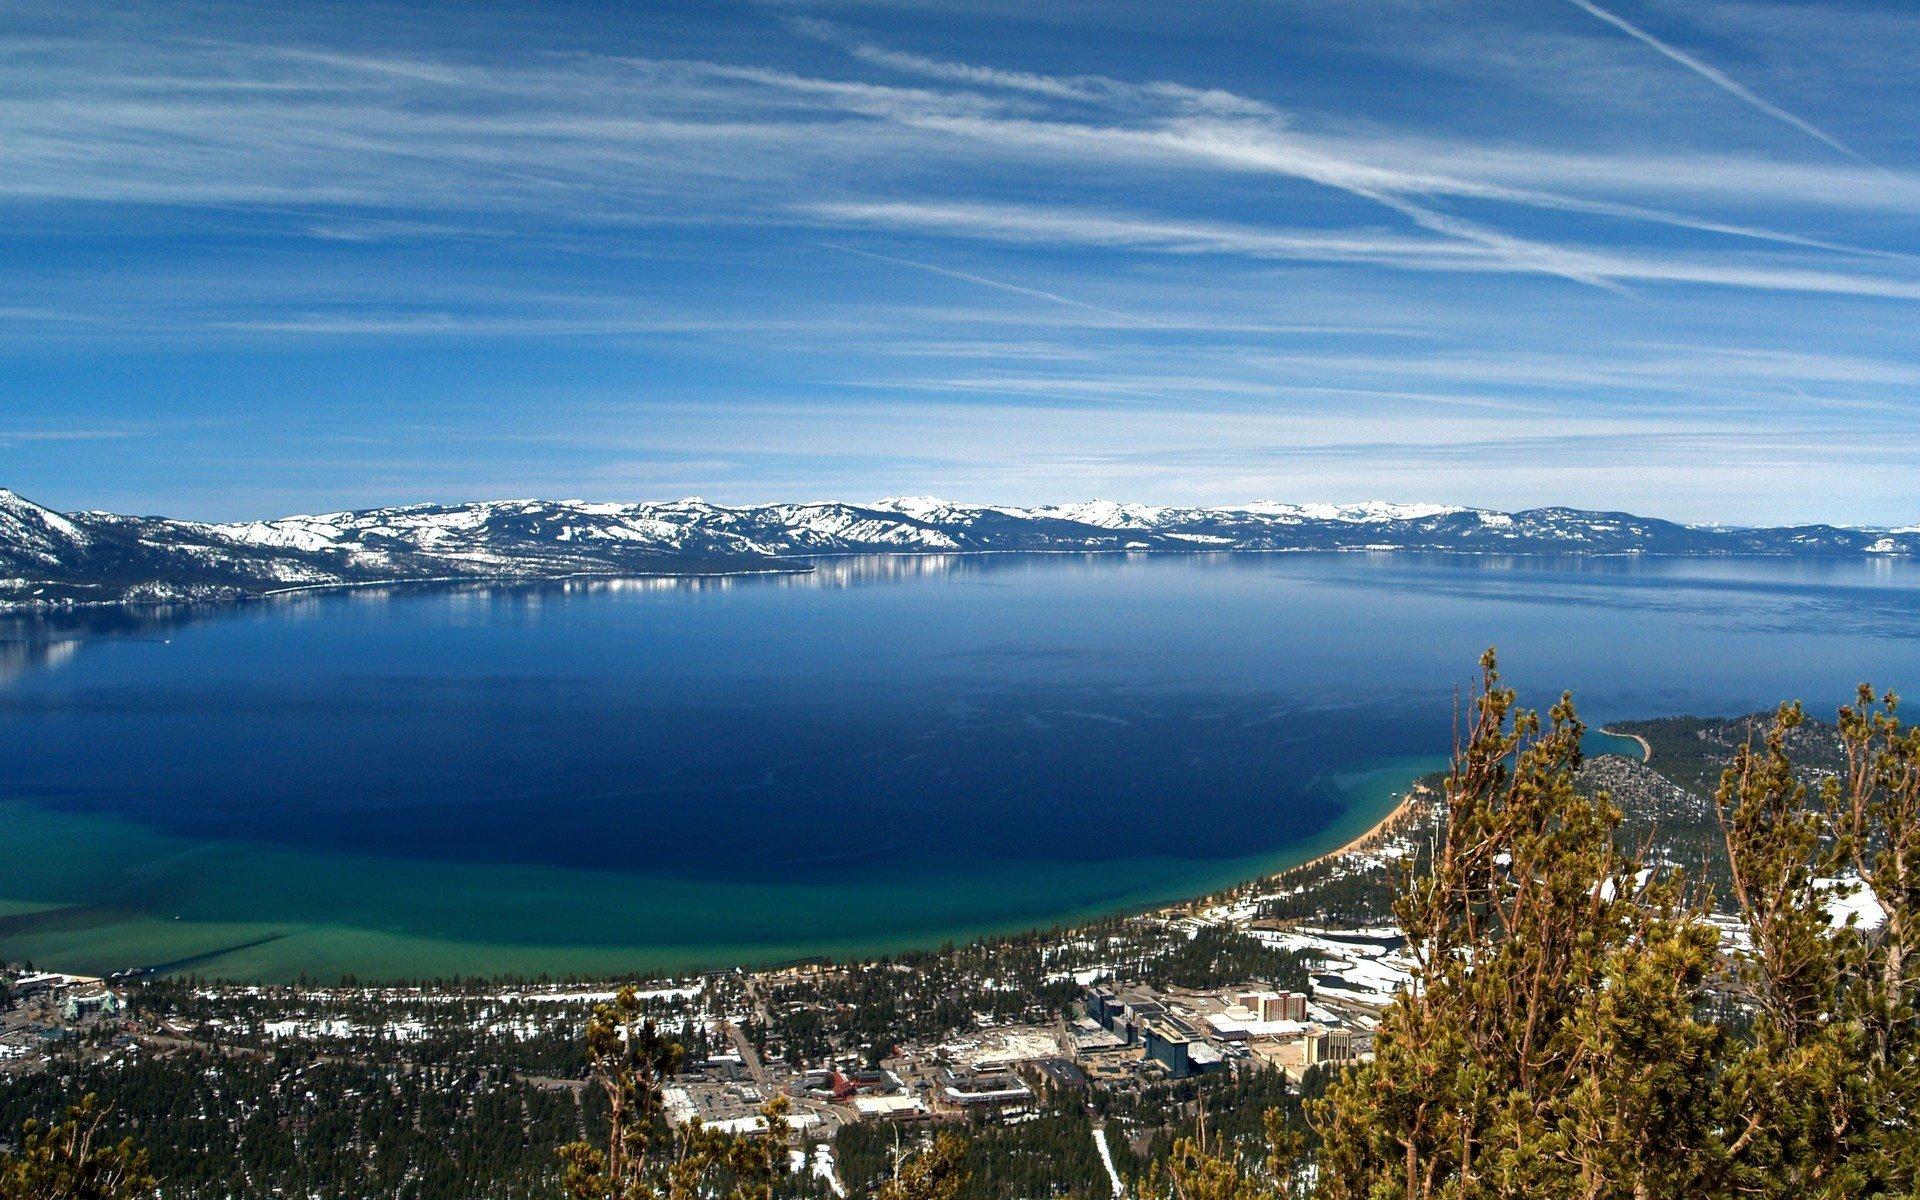 Lake Tahoe Wallpapers 1920x1200 Desktop Backgrounds